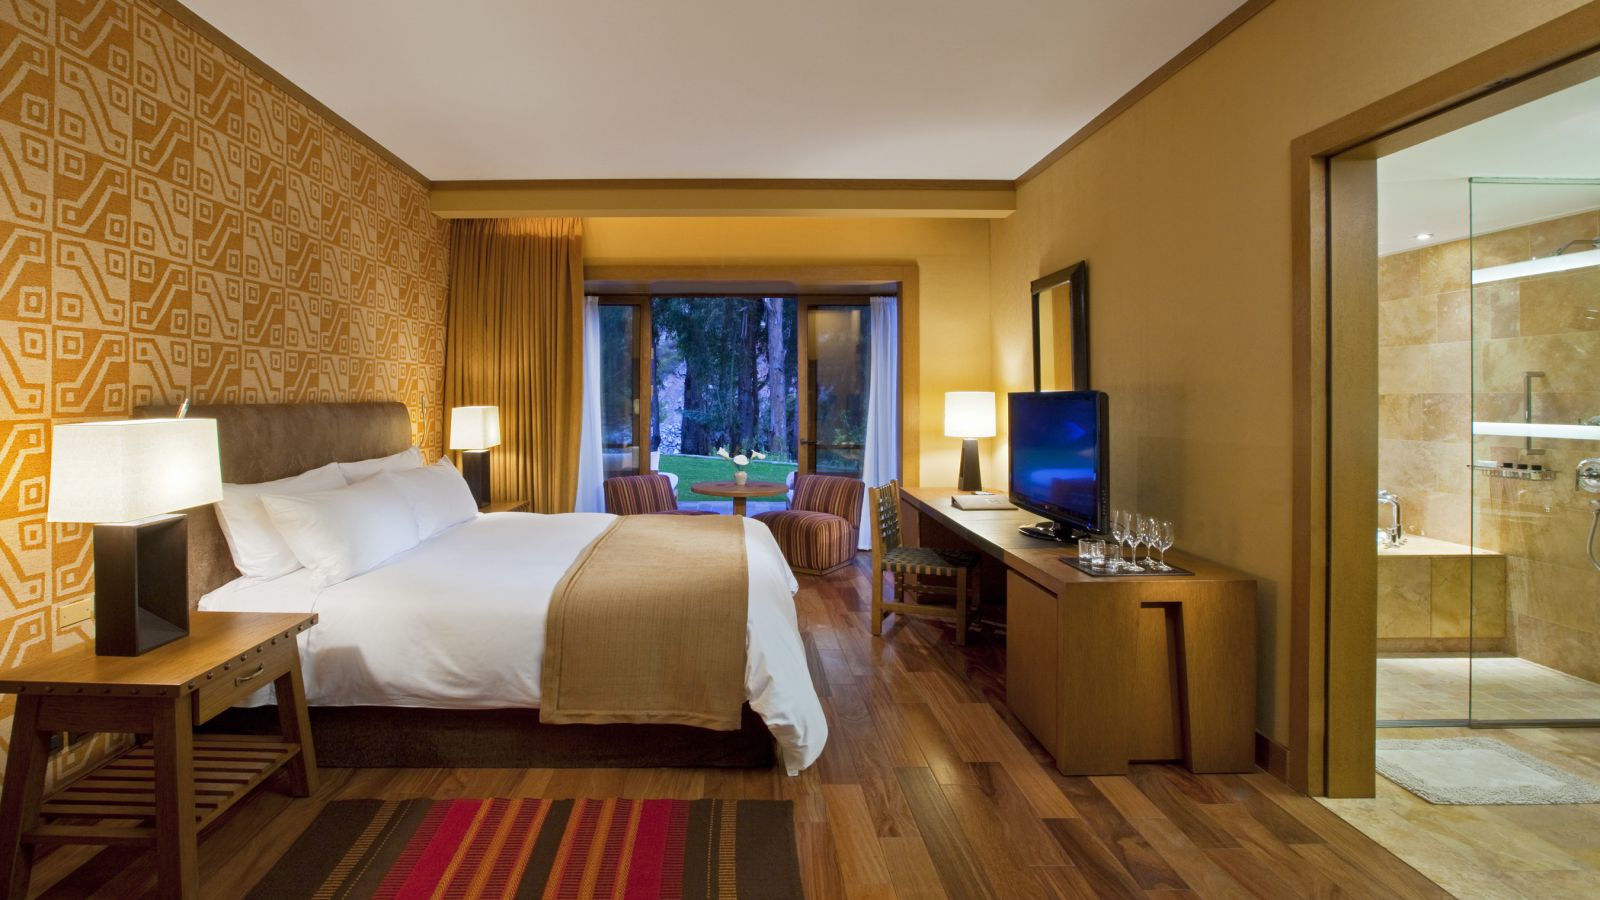 Quarto Deluxe do Hotel Tambo del Inka, no Vale Sagrado